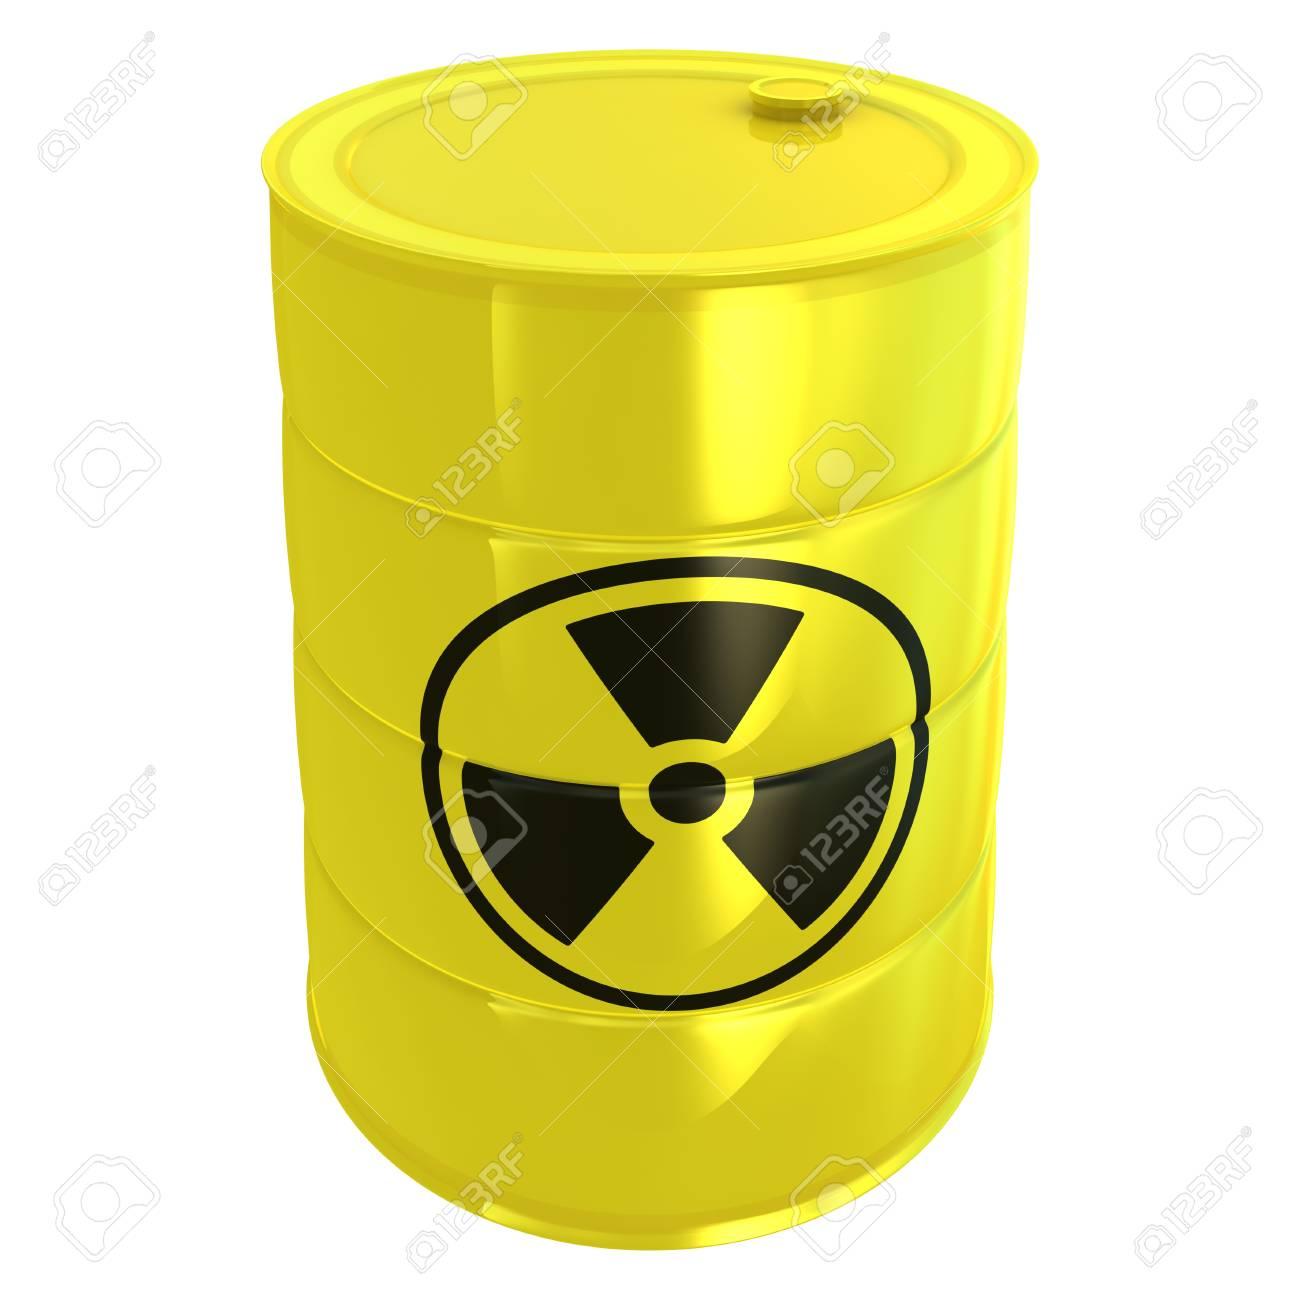 radioactive tank isolated on white Stock Photo - 9096651